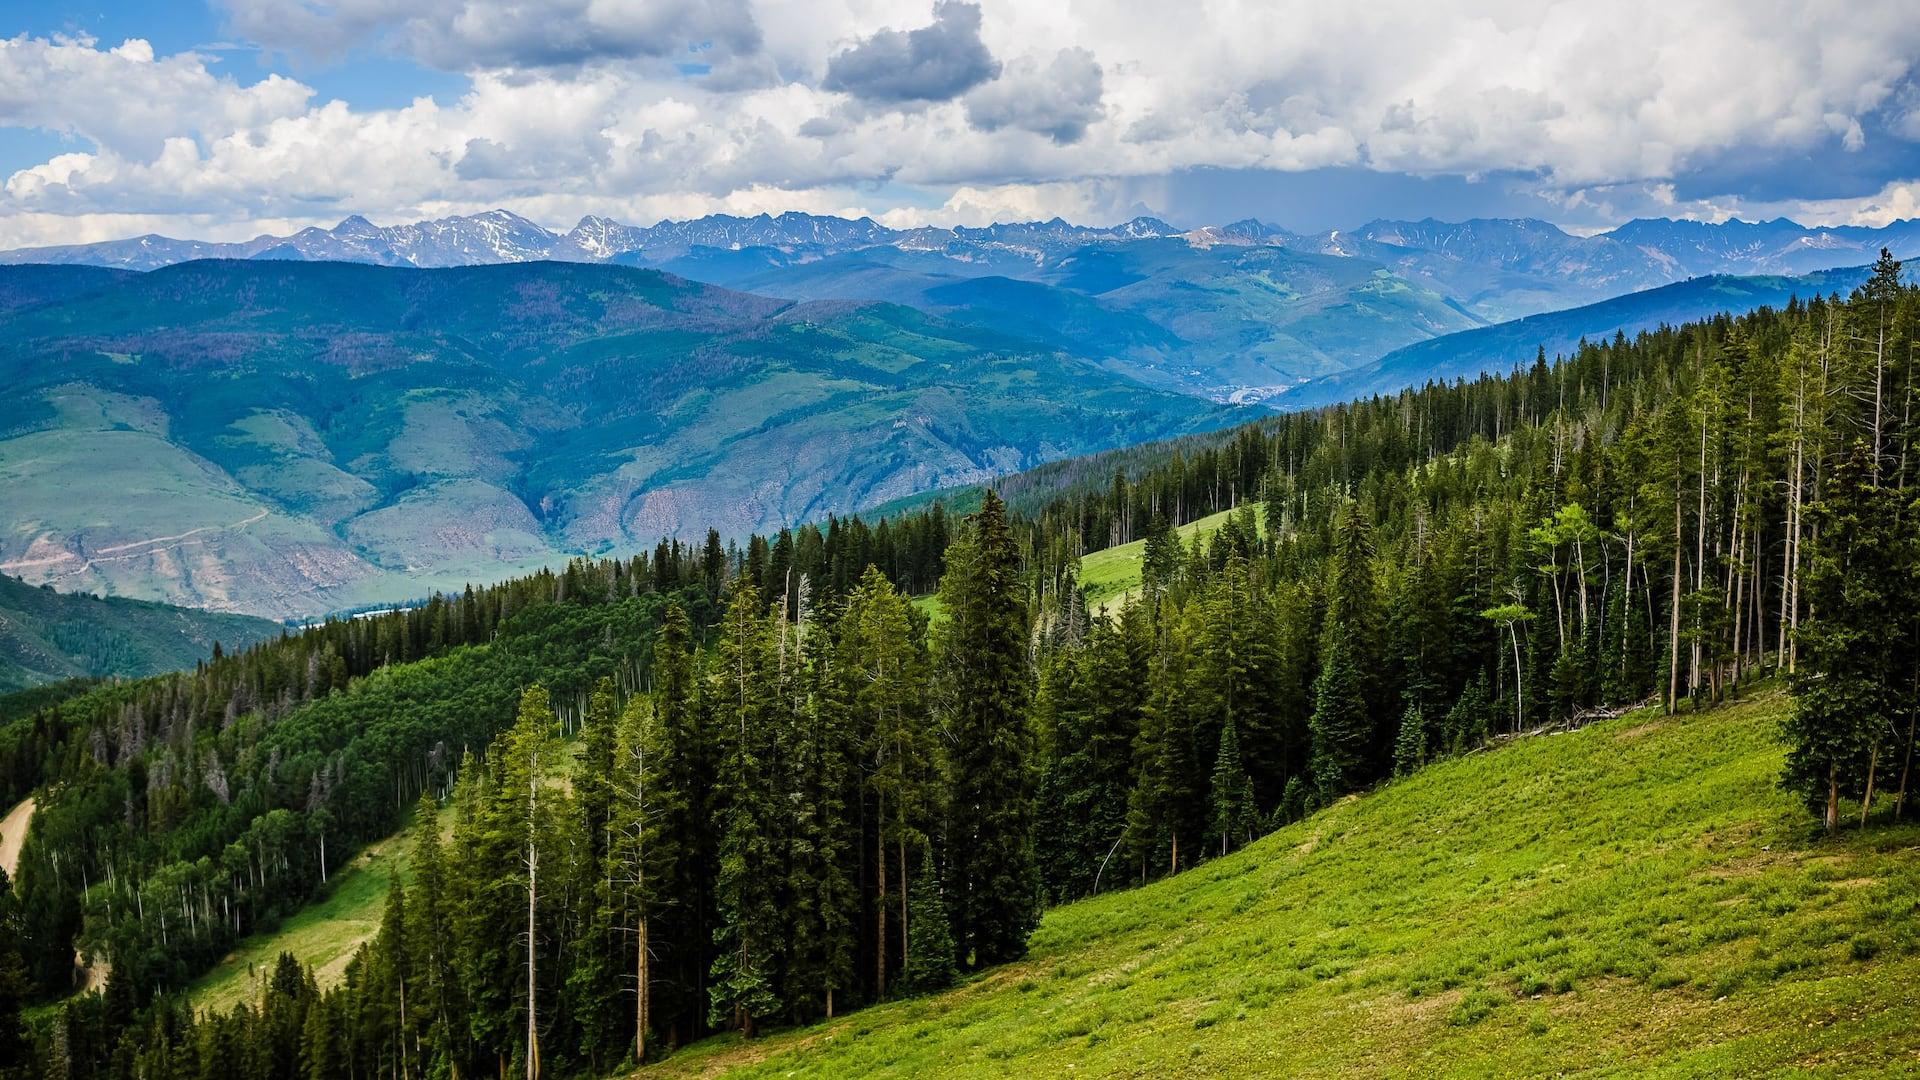 Mountains Scenic Trees